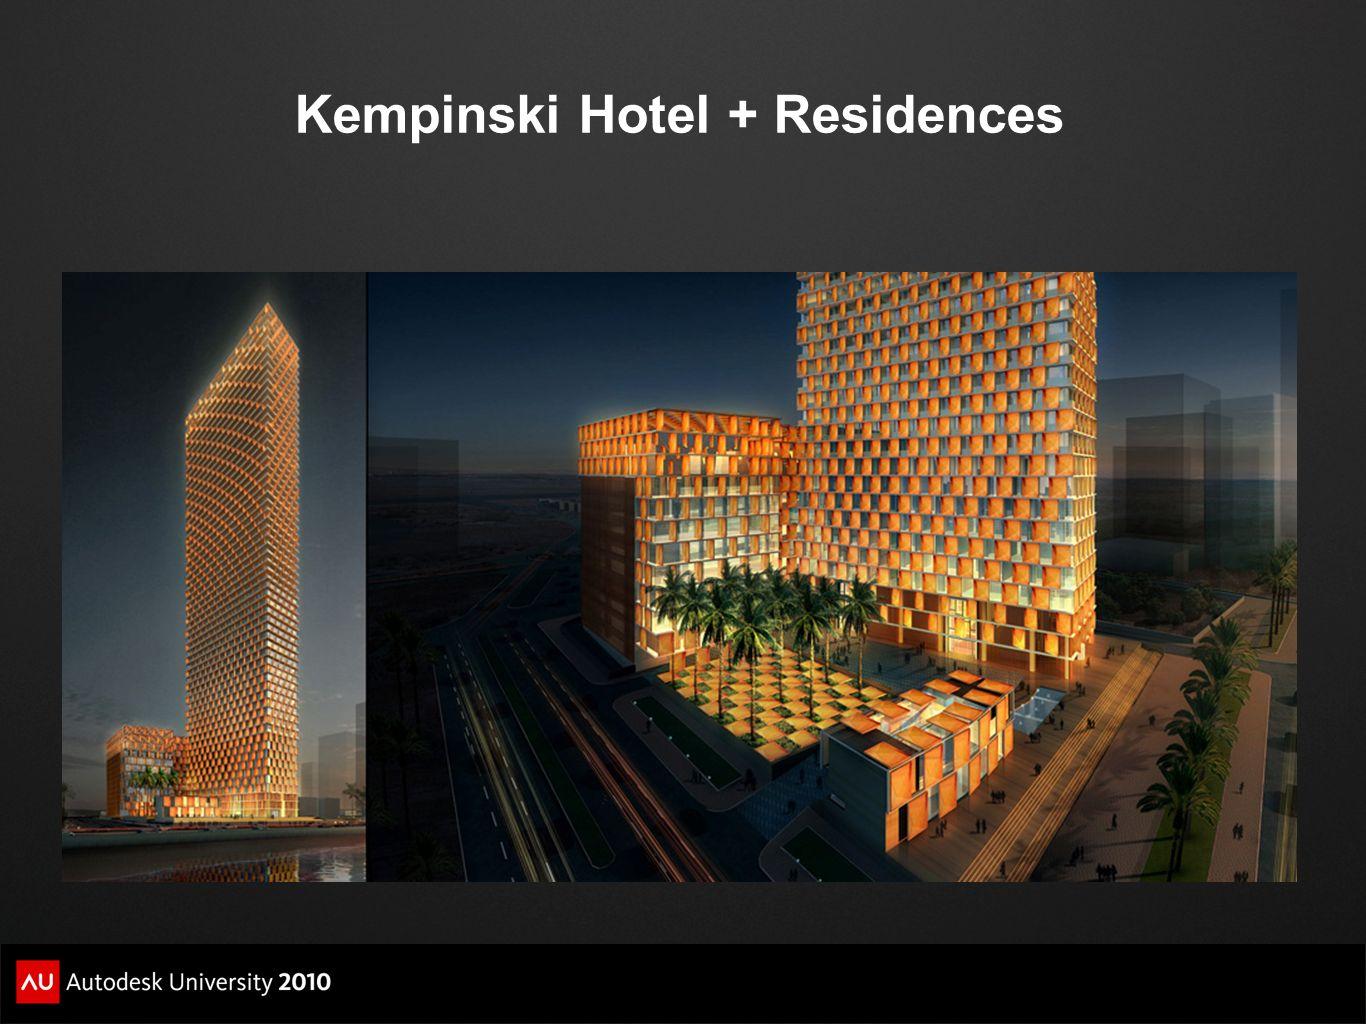 Kempinski Hotel + Residences